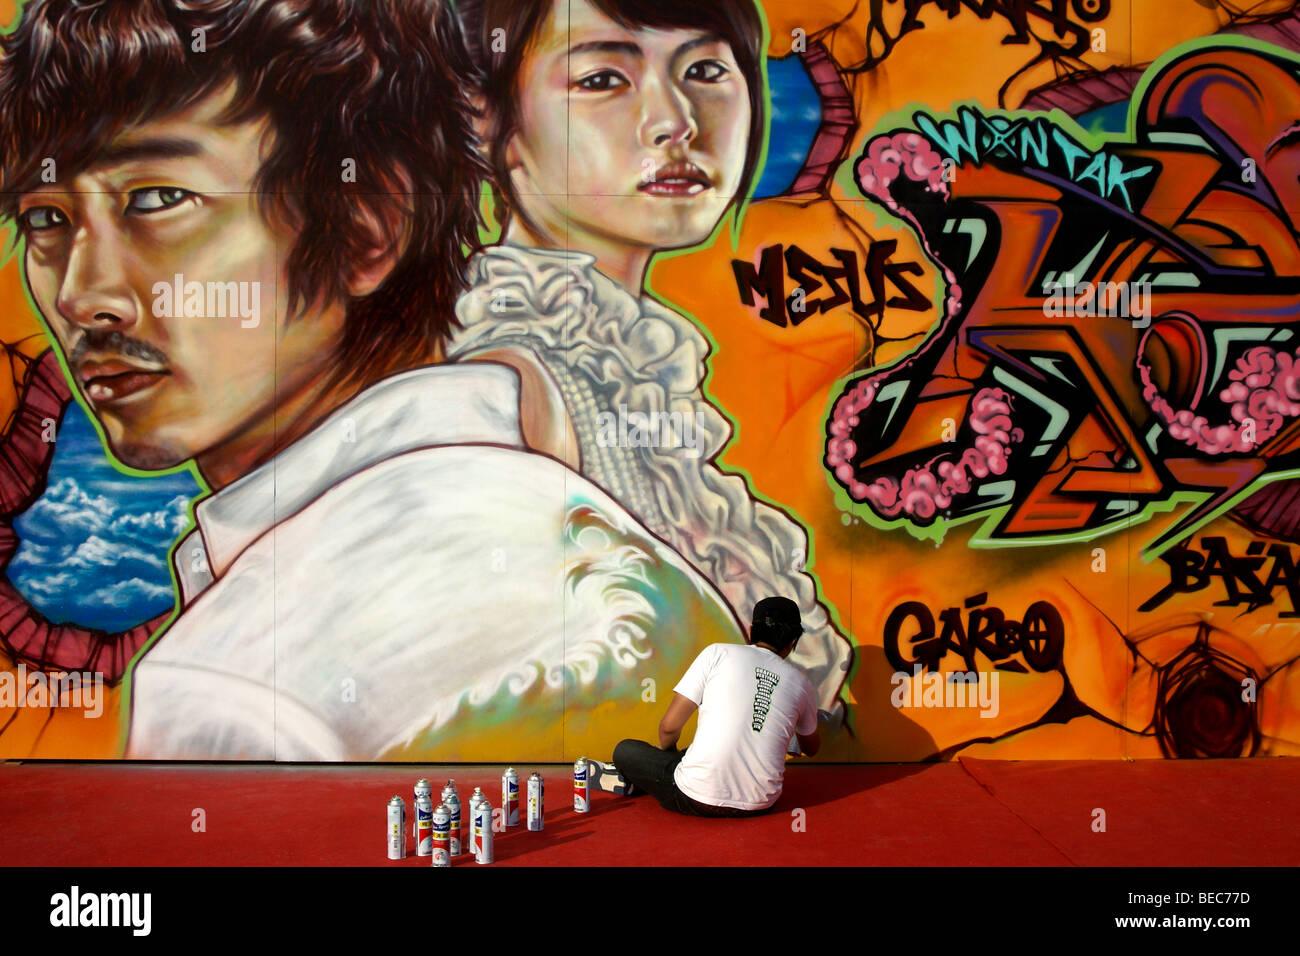 Artist painting mural at Graffiti Festival, Jinju Fortress, South Korea - Stock Image